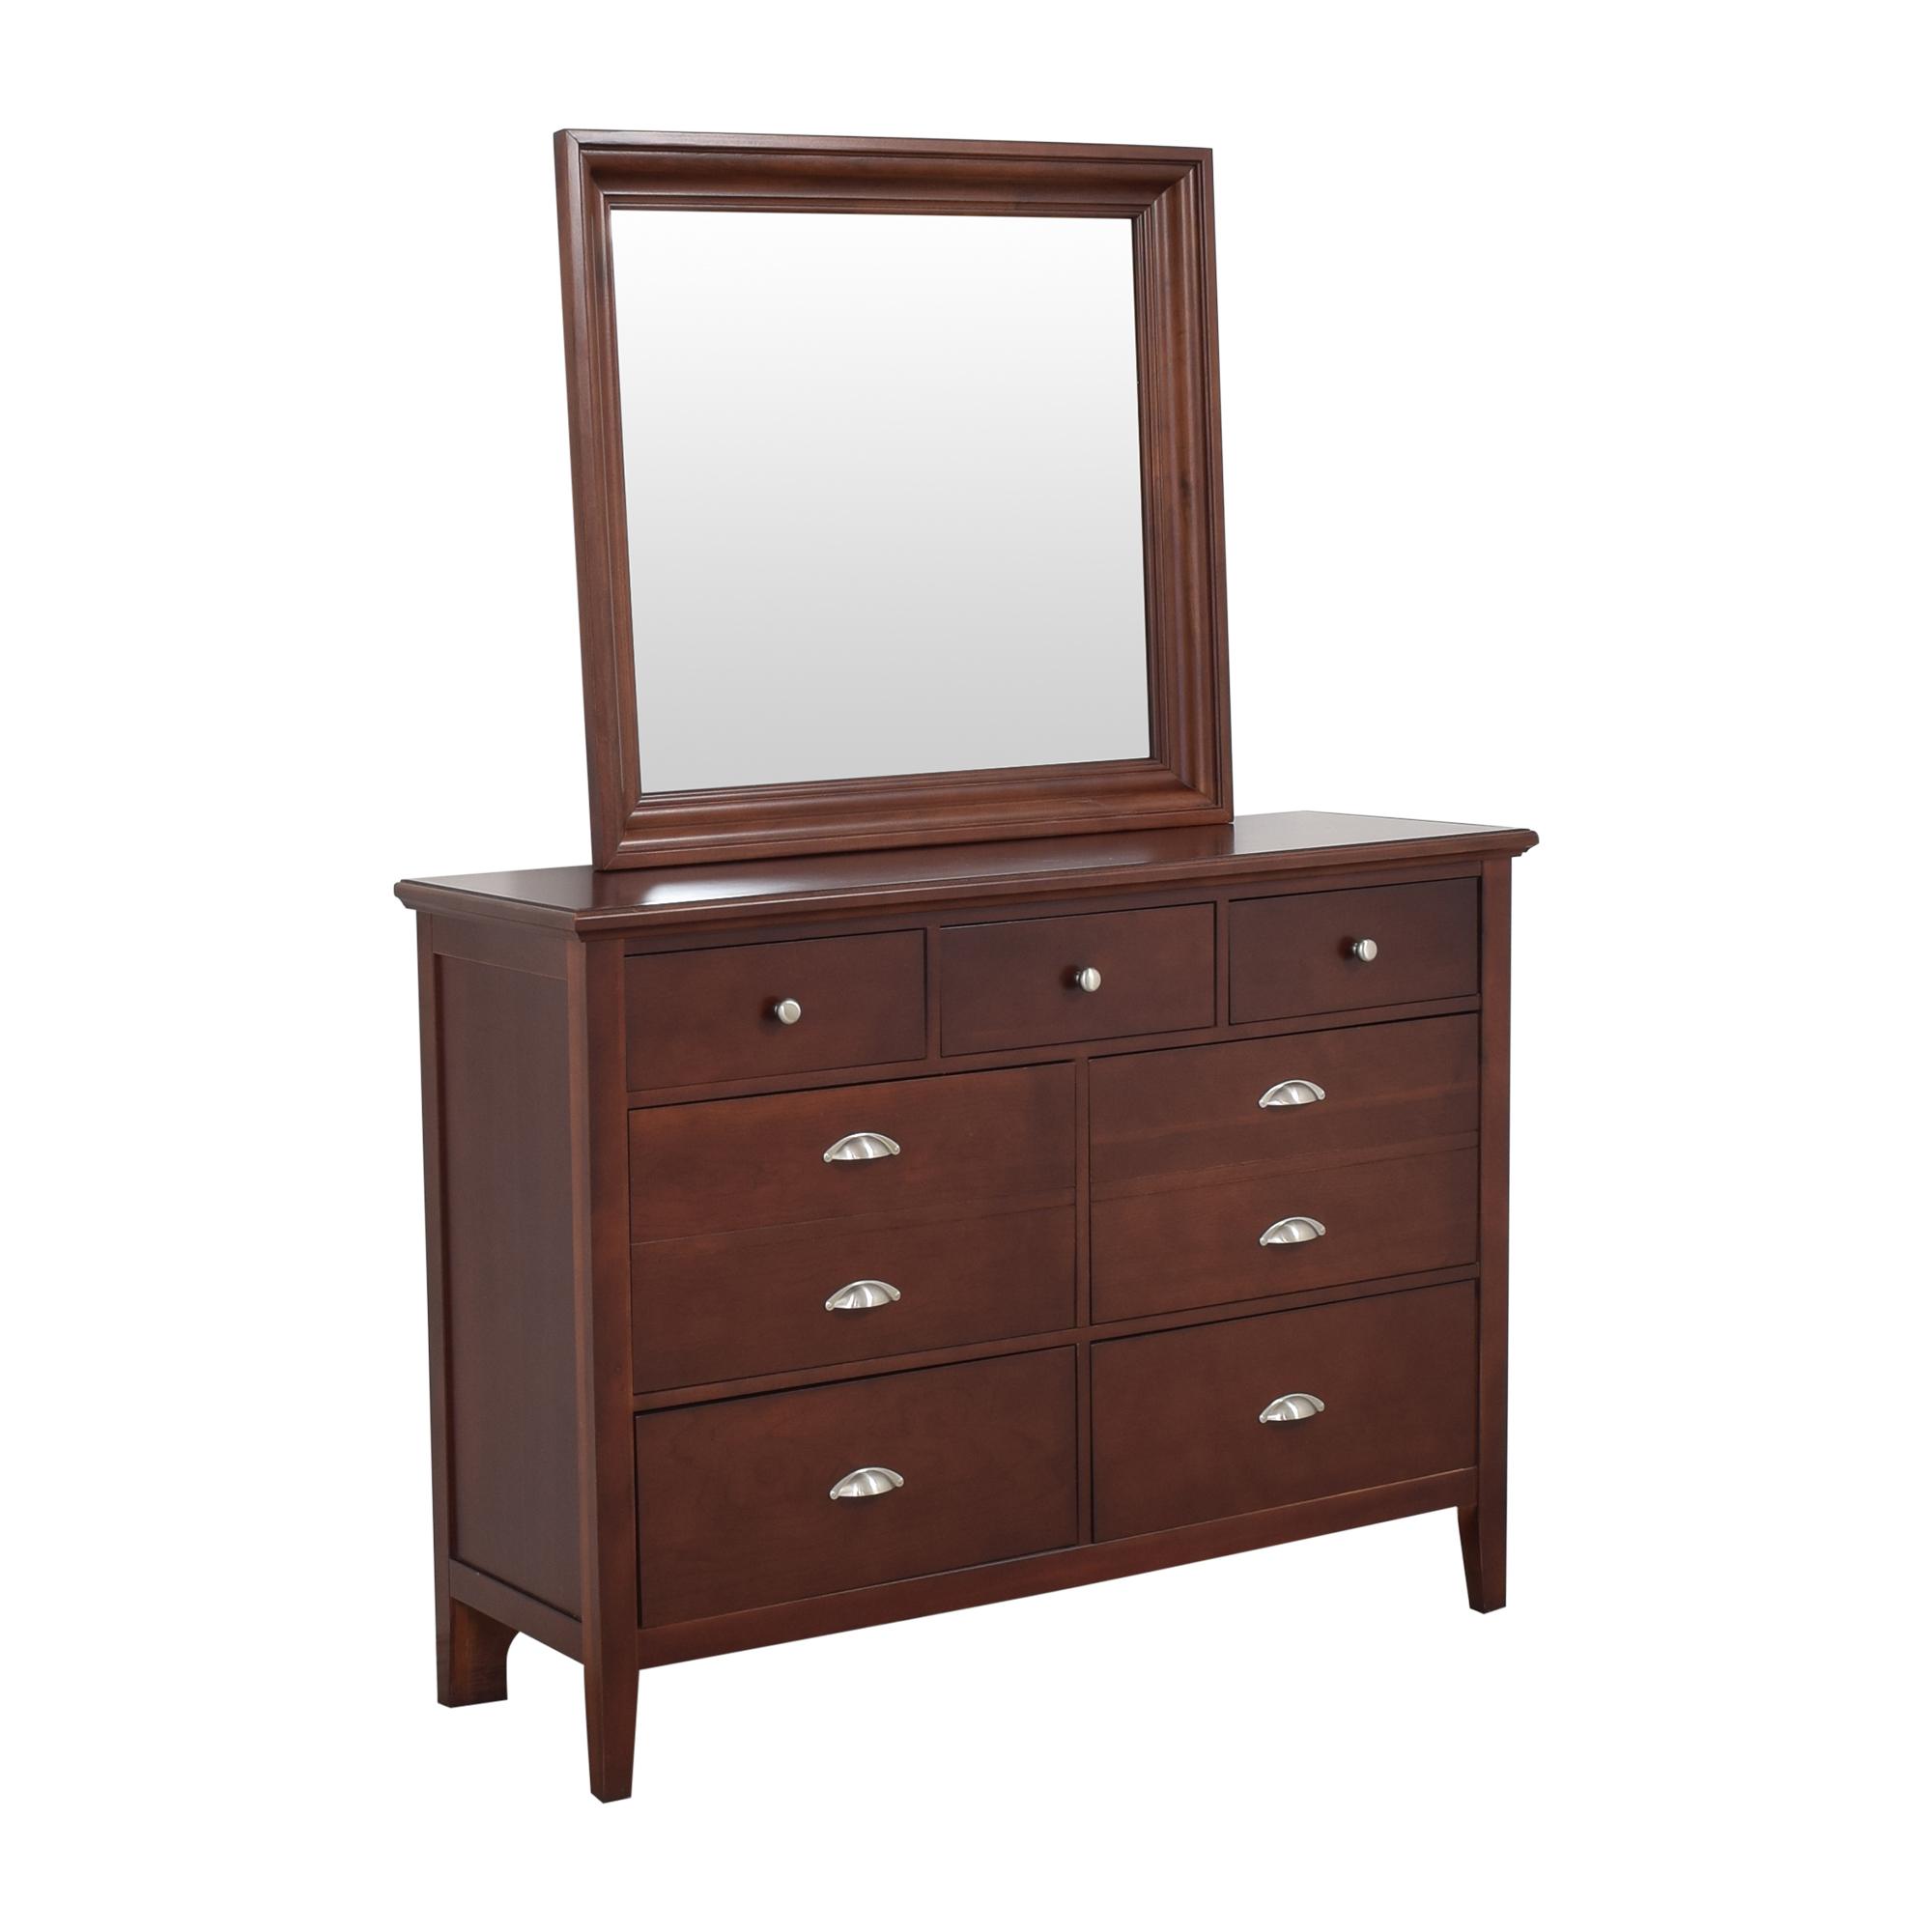 Vaughan-Bassett Vaughan-Bassett Twilight Triple Dresser with Mirror coupon